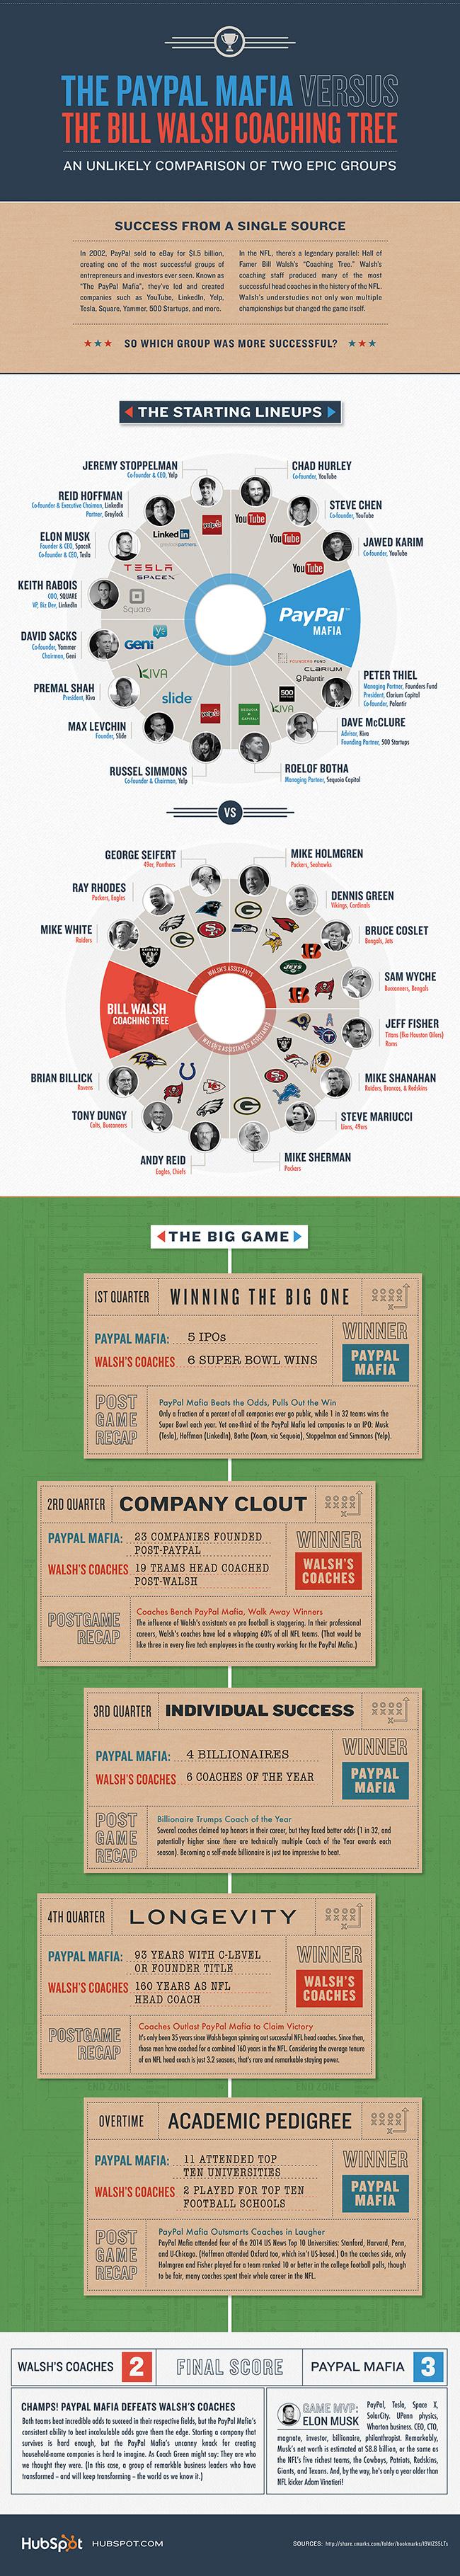 hubspot-paypal-nfl-infographic-650-pixels